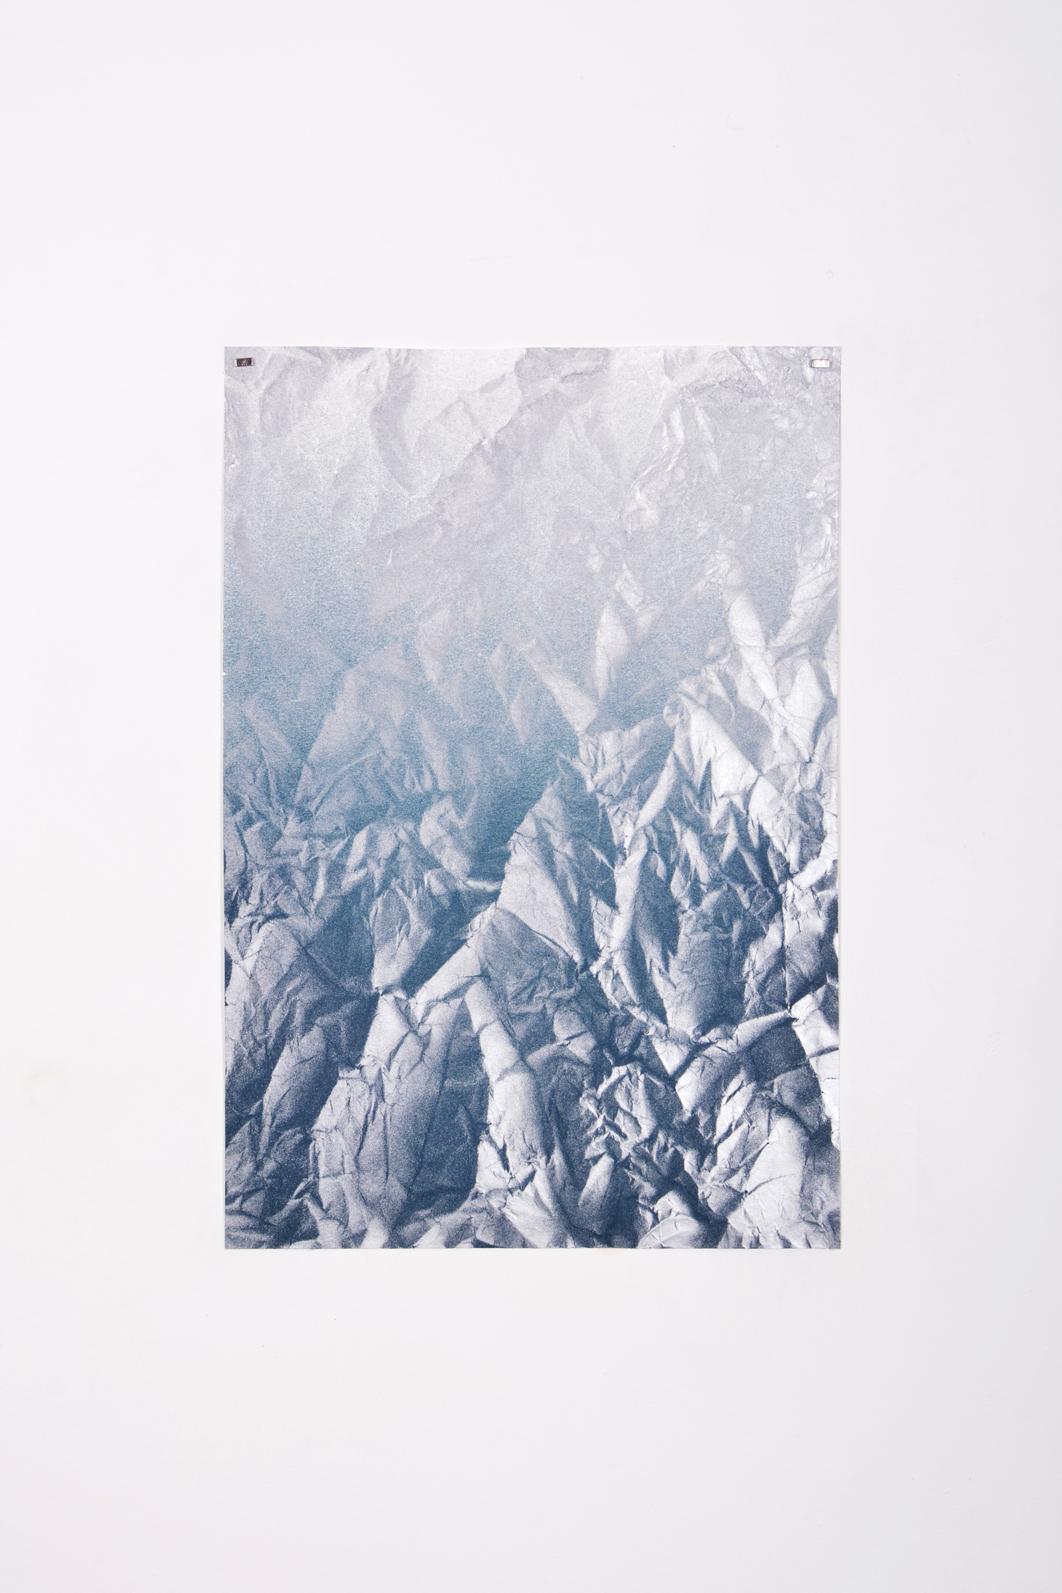 Benjamin Ottoz_ Double V Gallery_A3 Bicolore (3).jpg